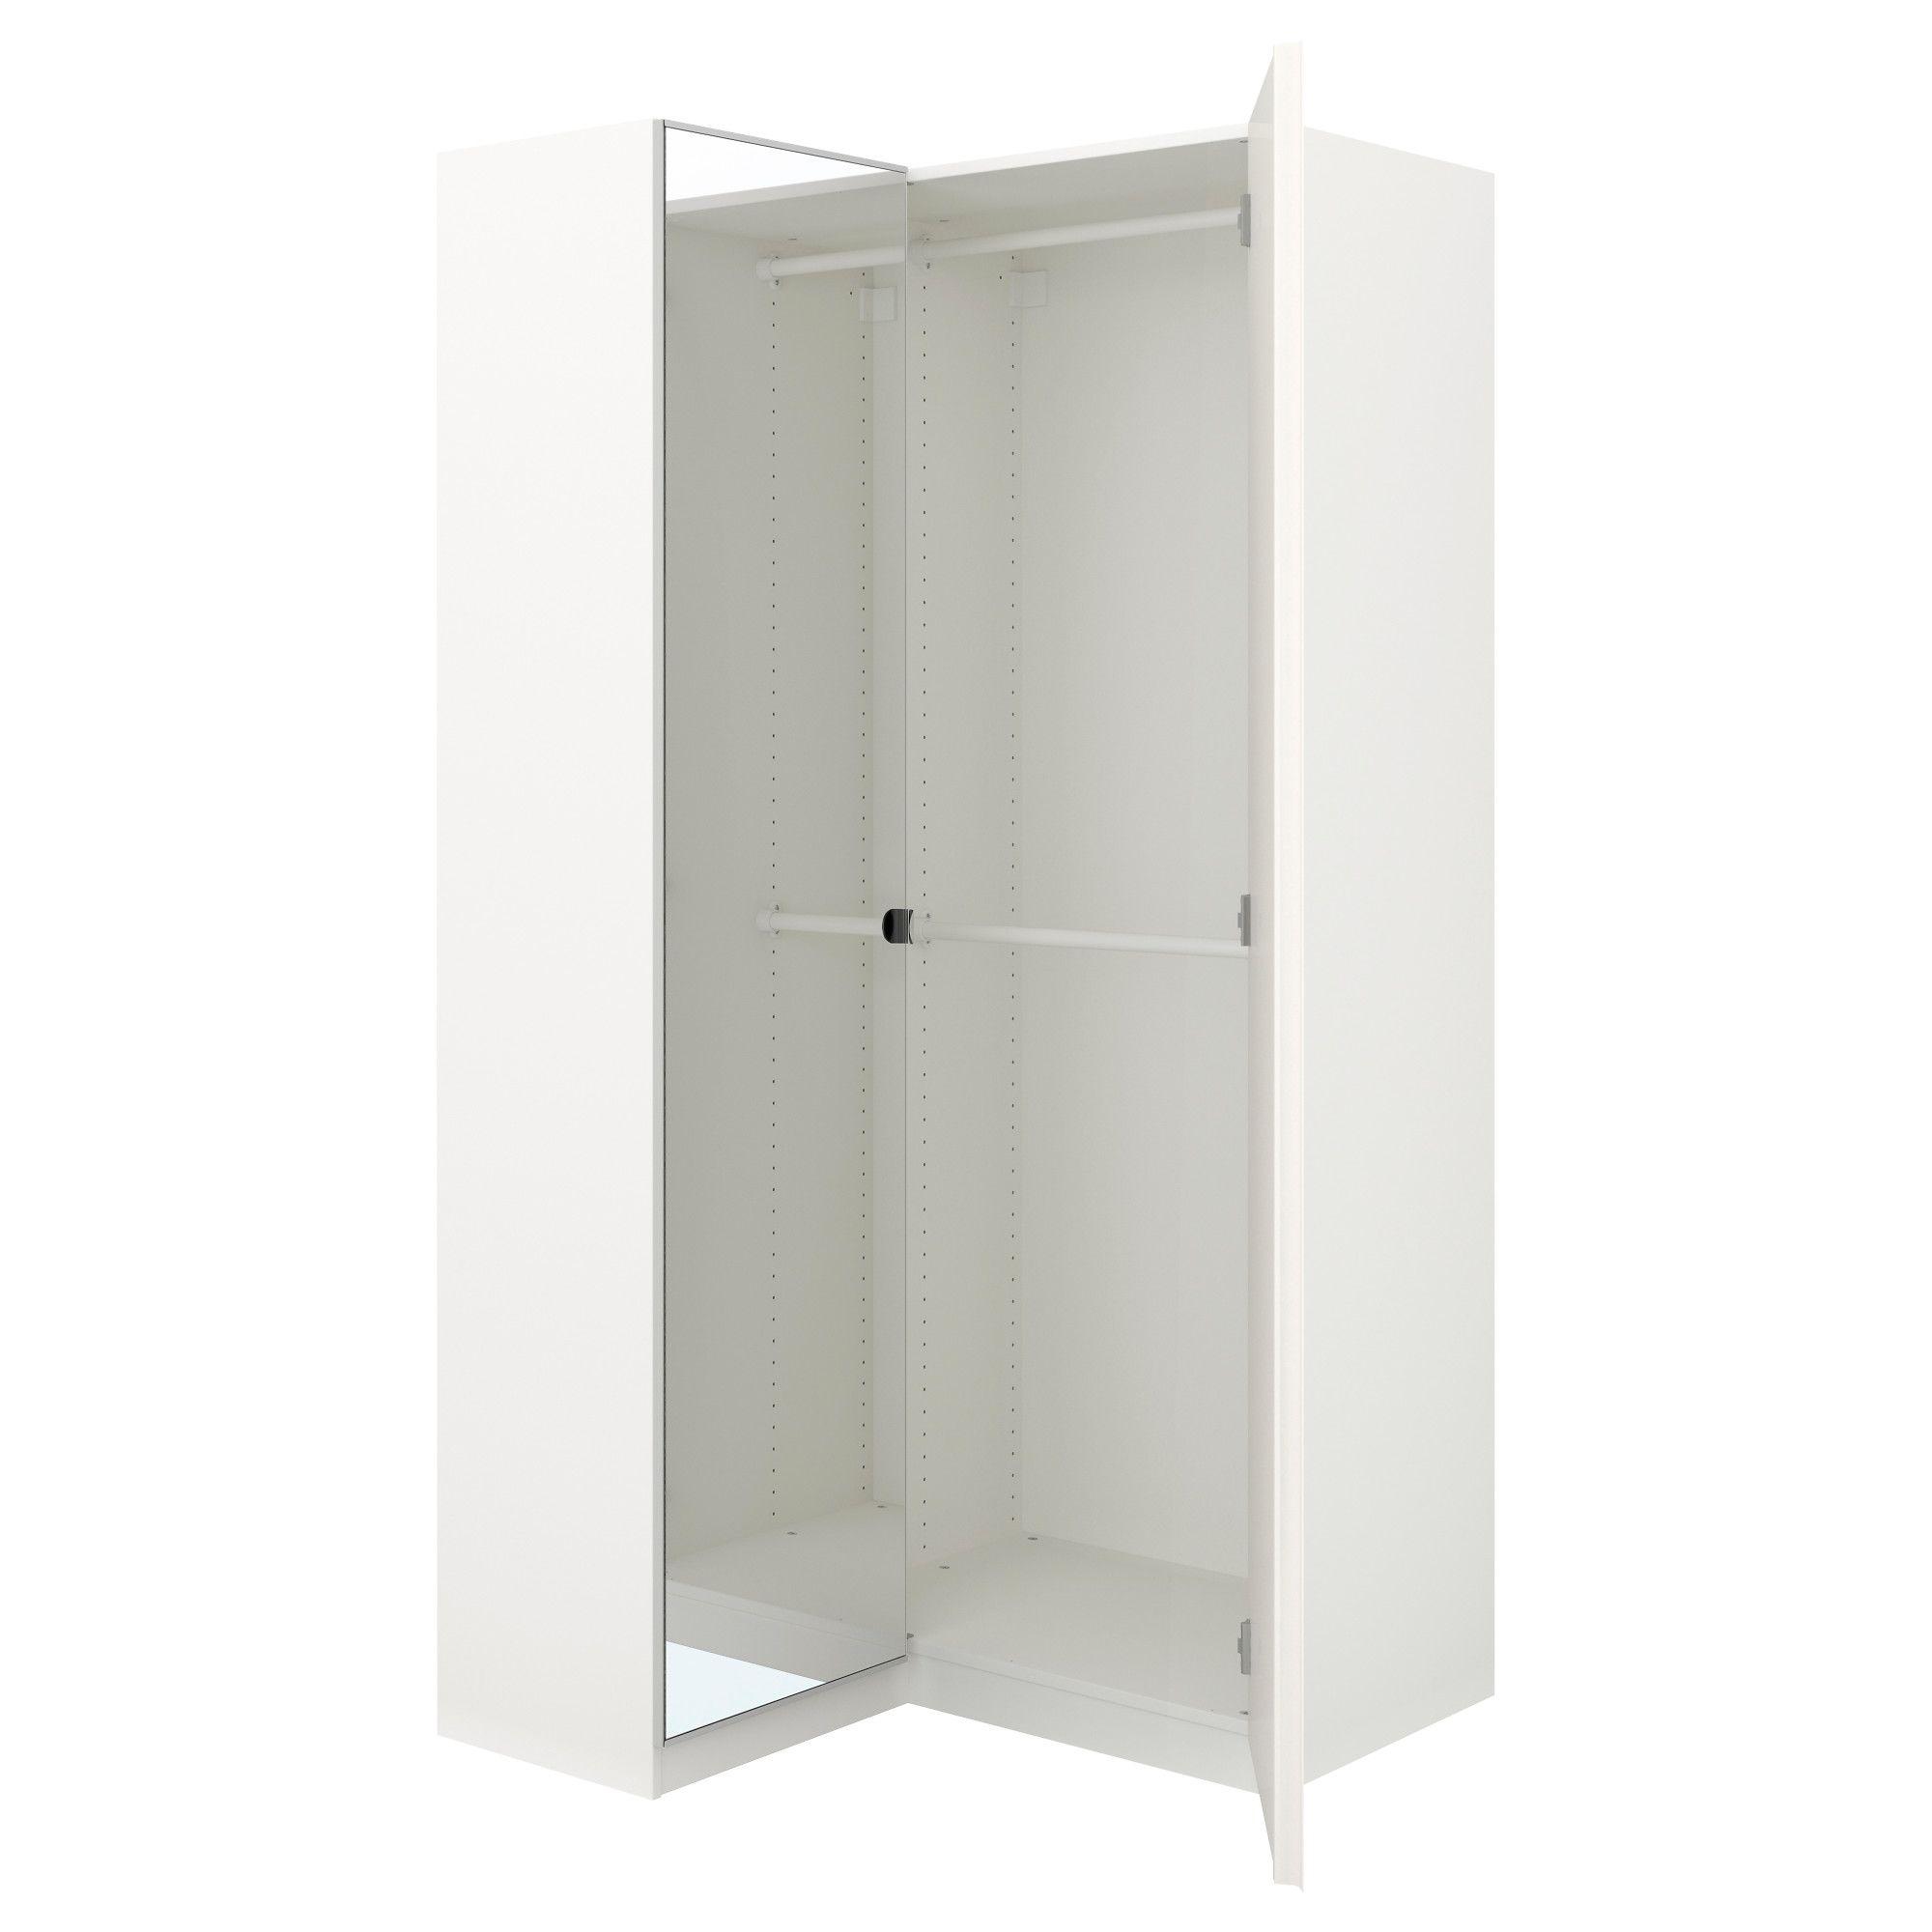 Pax Corner Wardrobe White Fardal Vikedal 43 1 2 34 5 8x79 1 8